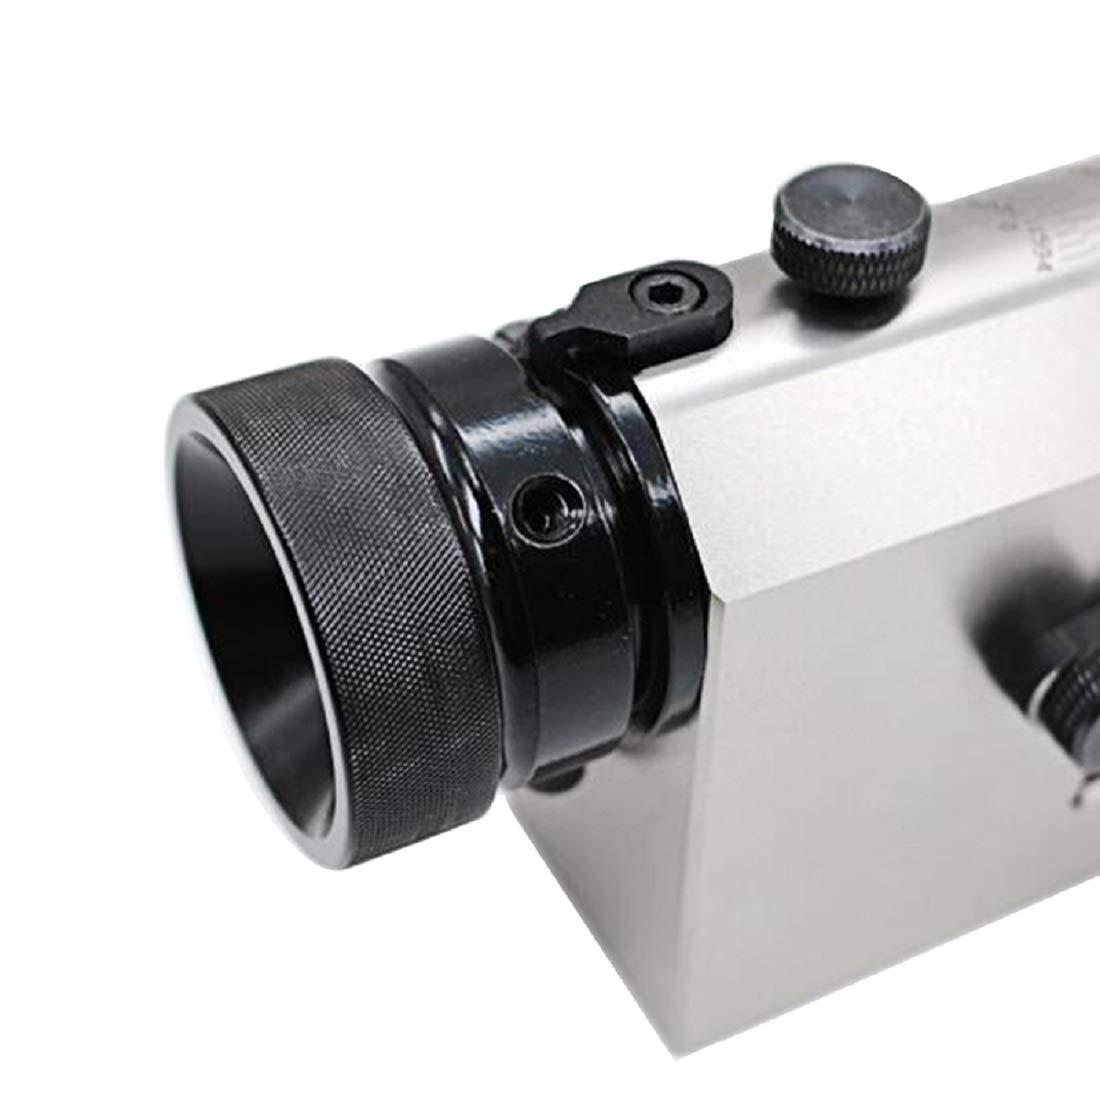 Perspective Grinding Wheel Dresser Visual Optical Radius Angle Dresser Value Line Optical Grinding Wheel Radius Angle Dresser by tinsay (Image #7)